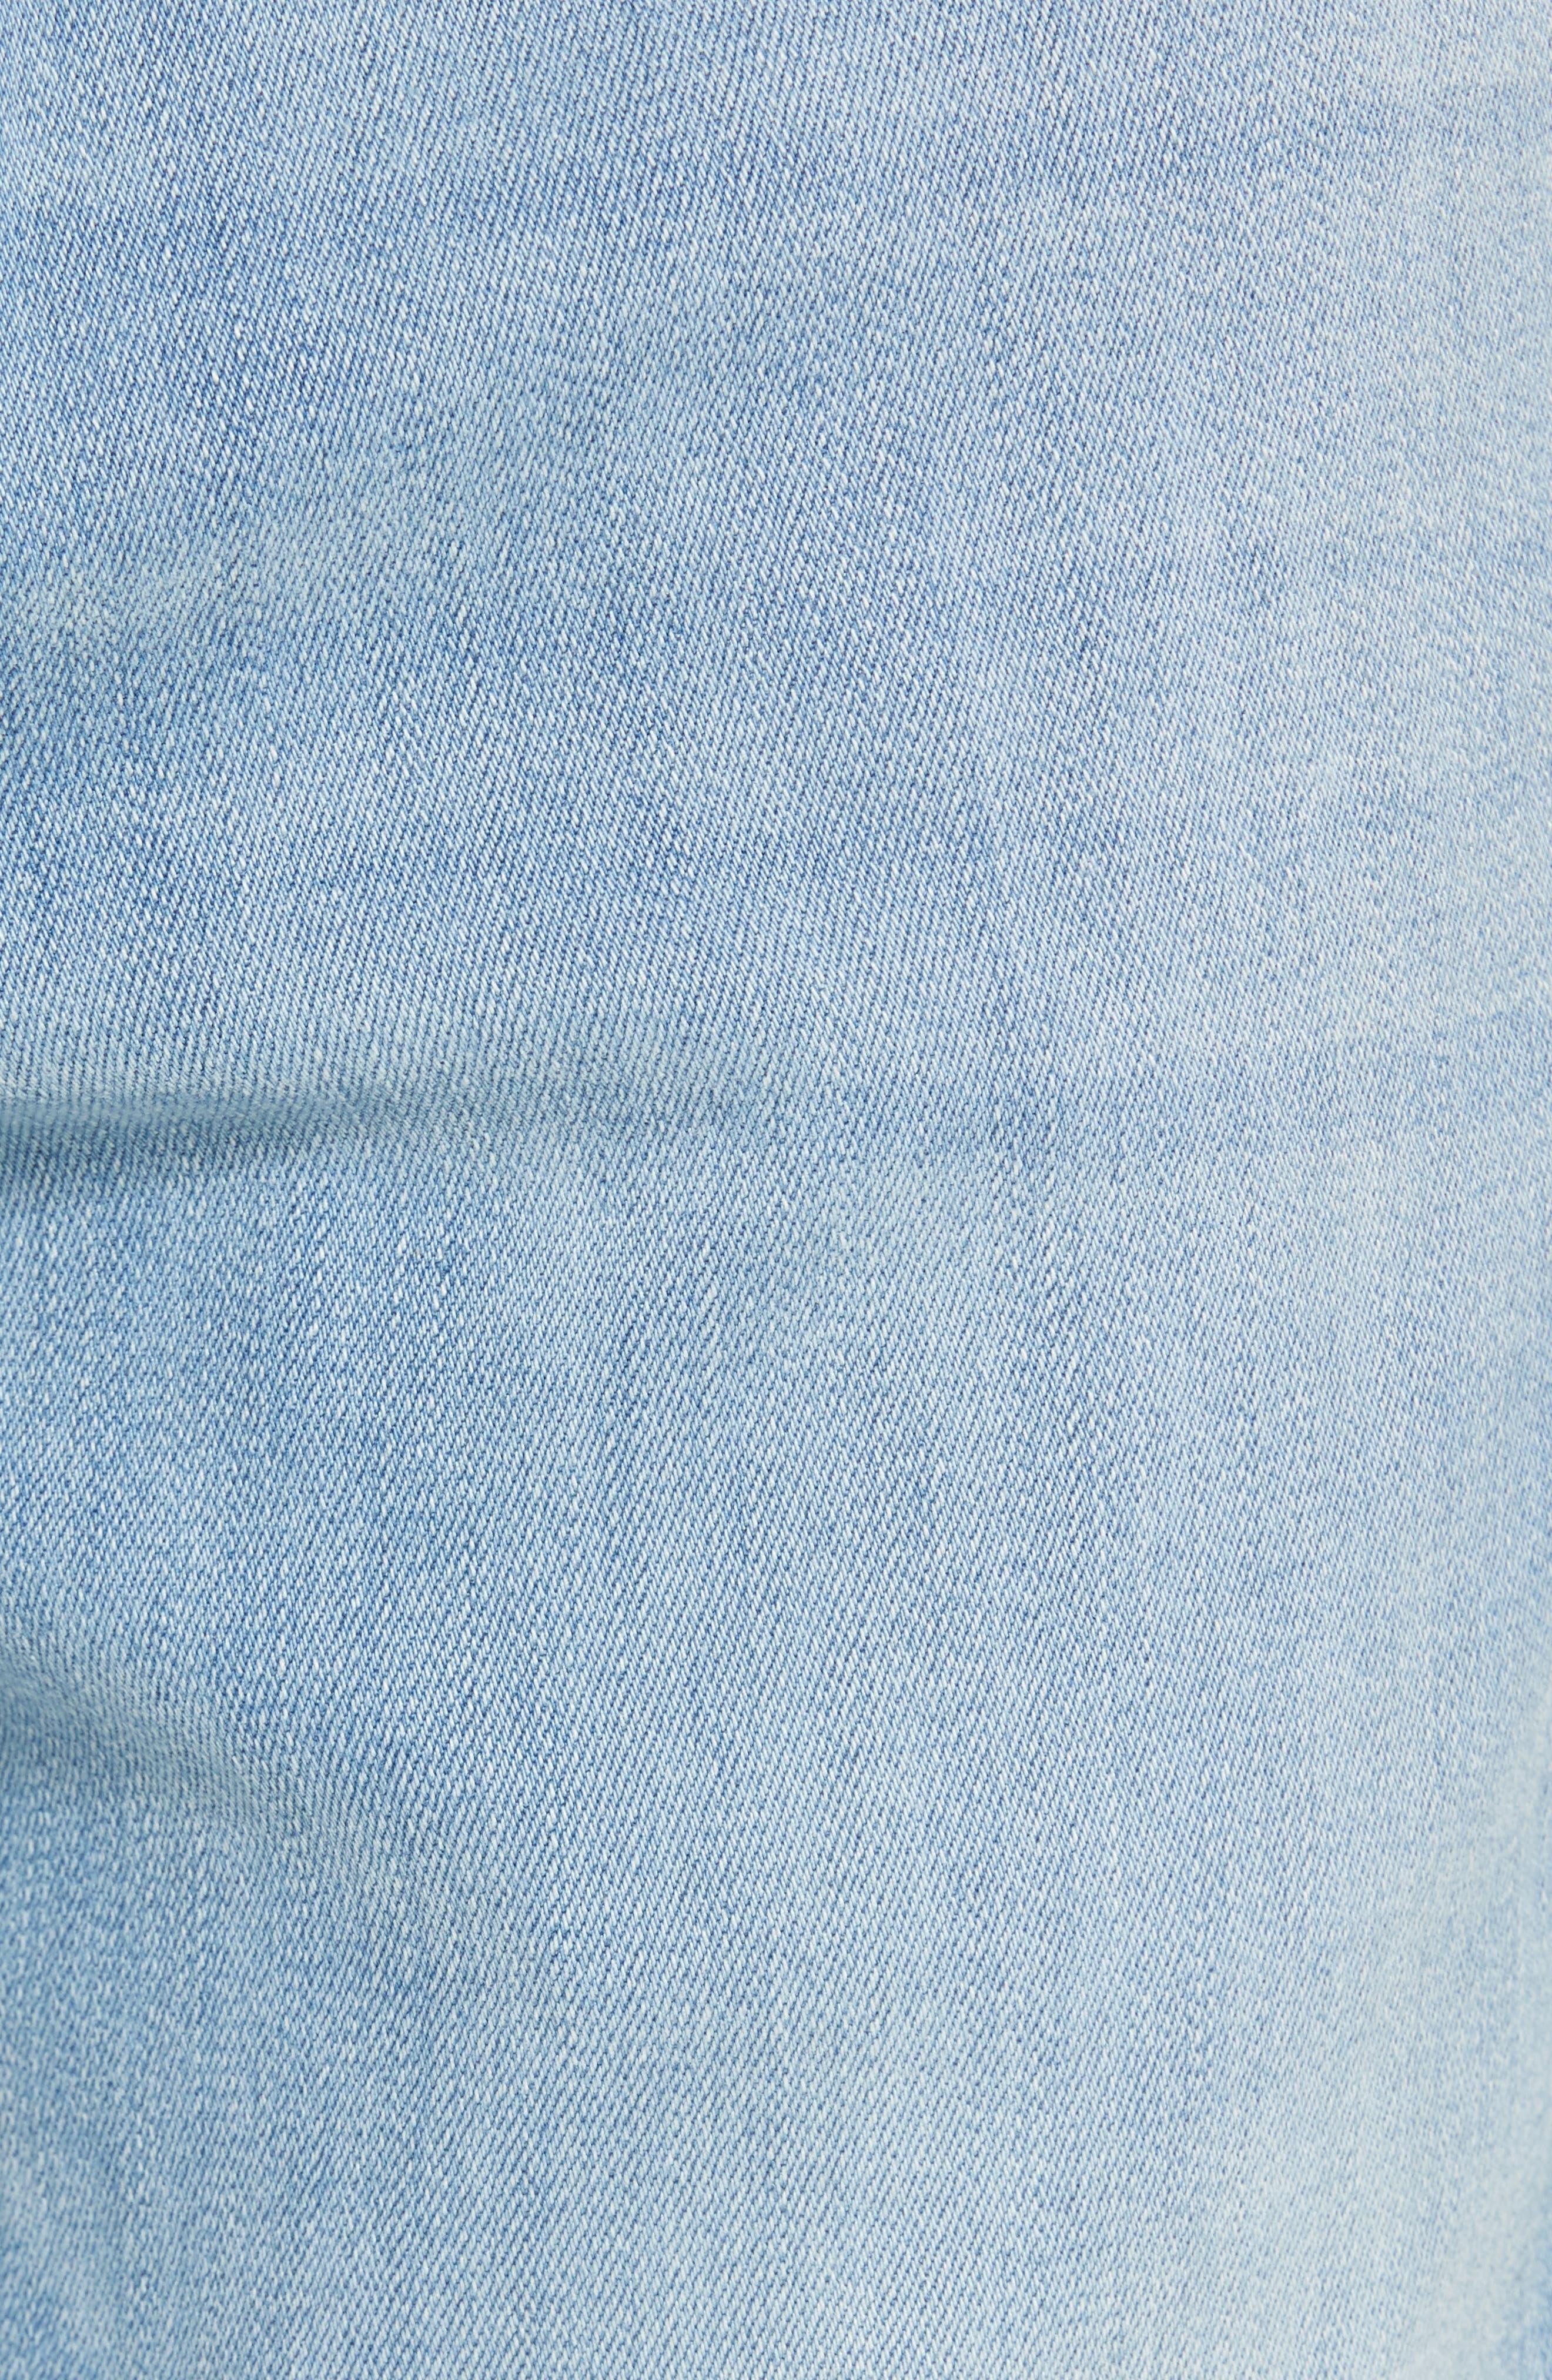 Torino Slim Fit Jeans,                             Alternate thumbnail 5, color,                             Abbey Blue